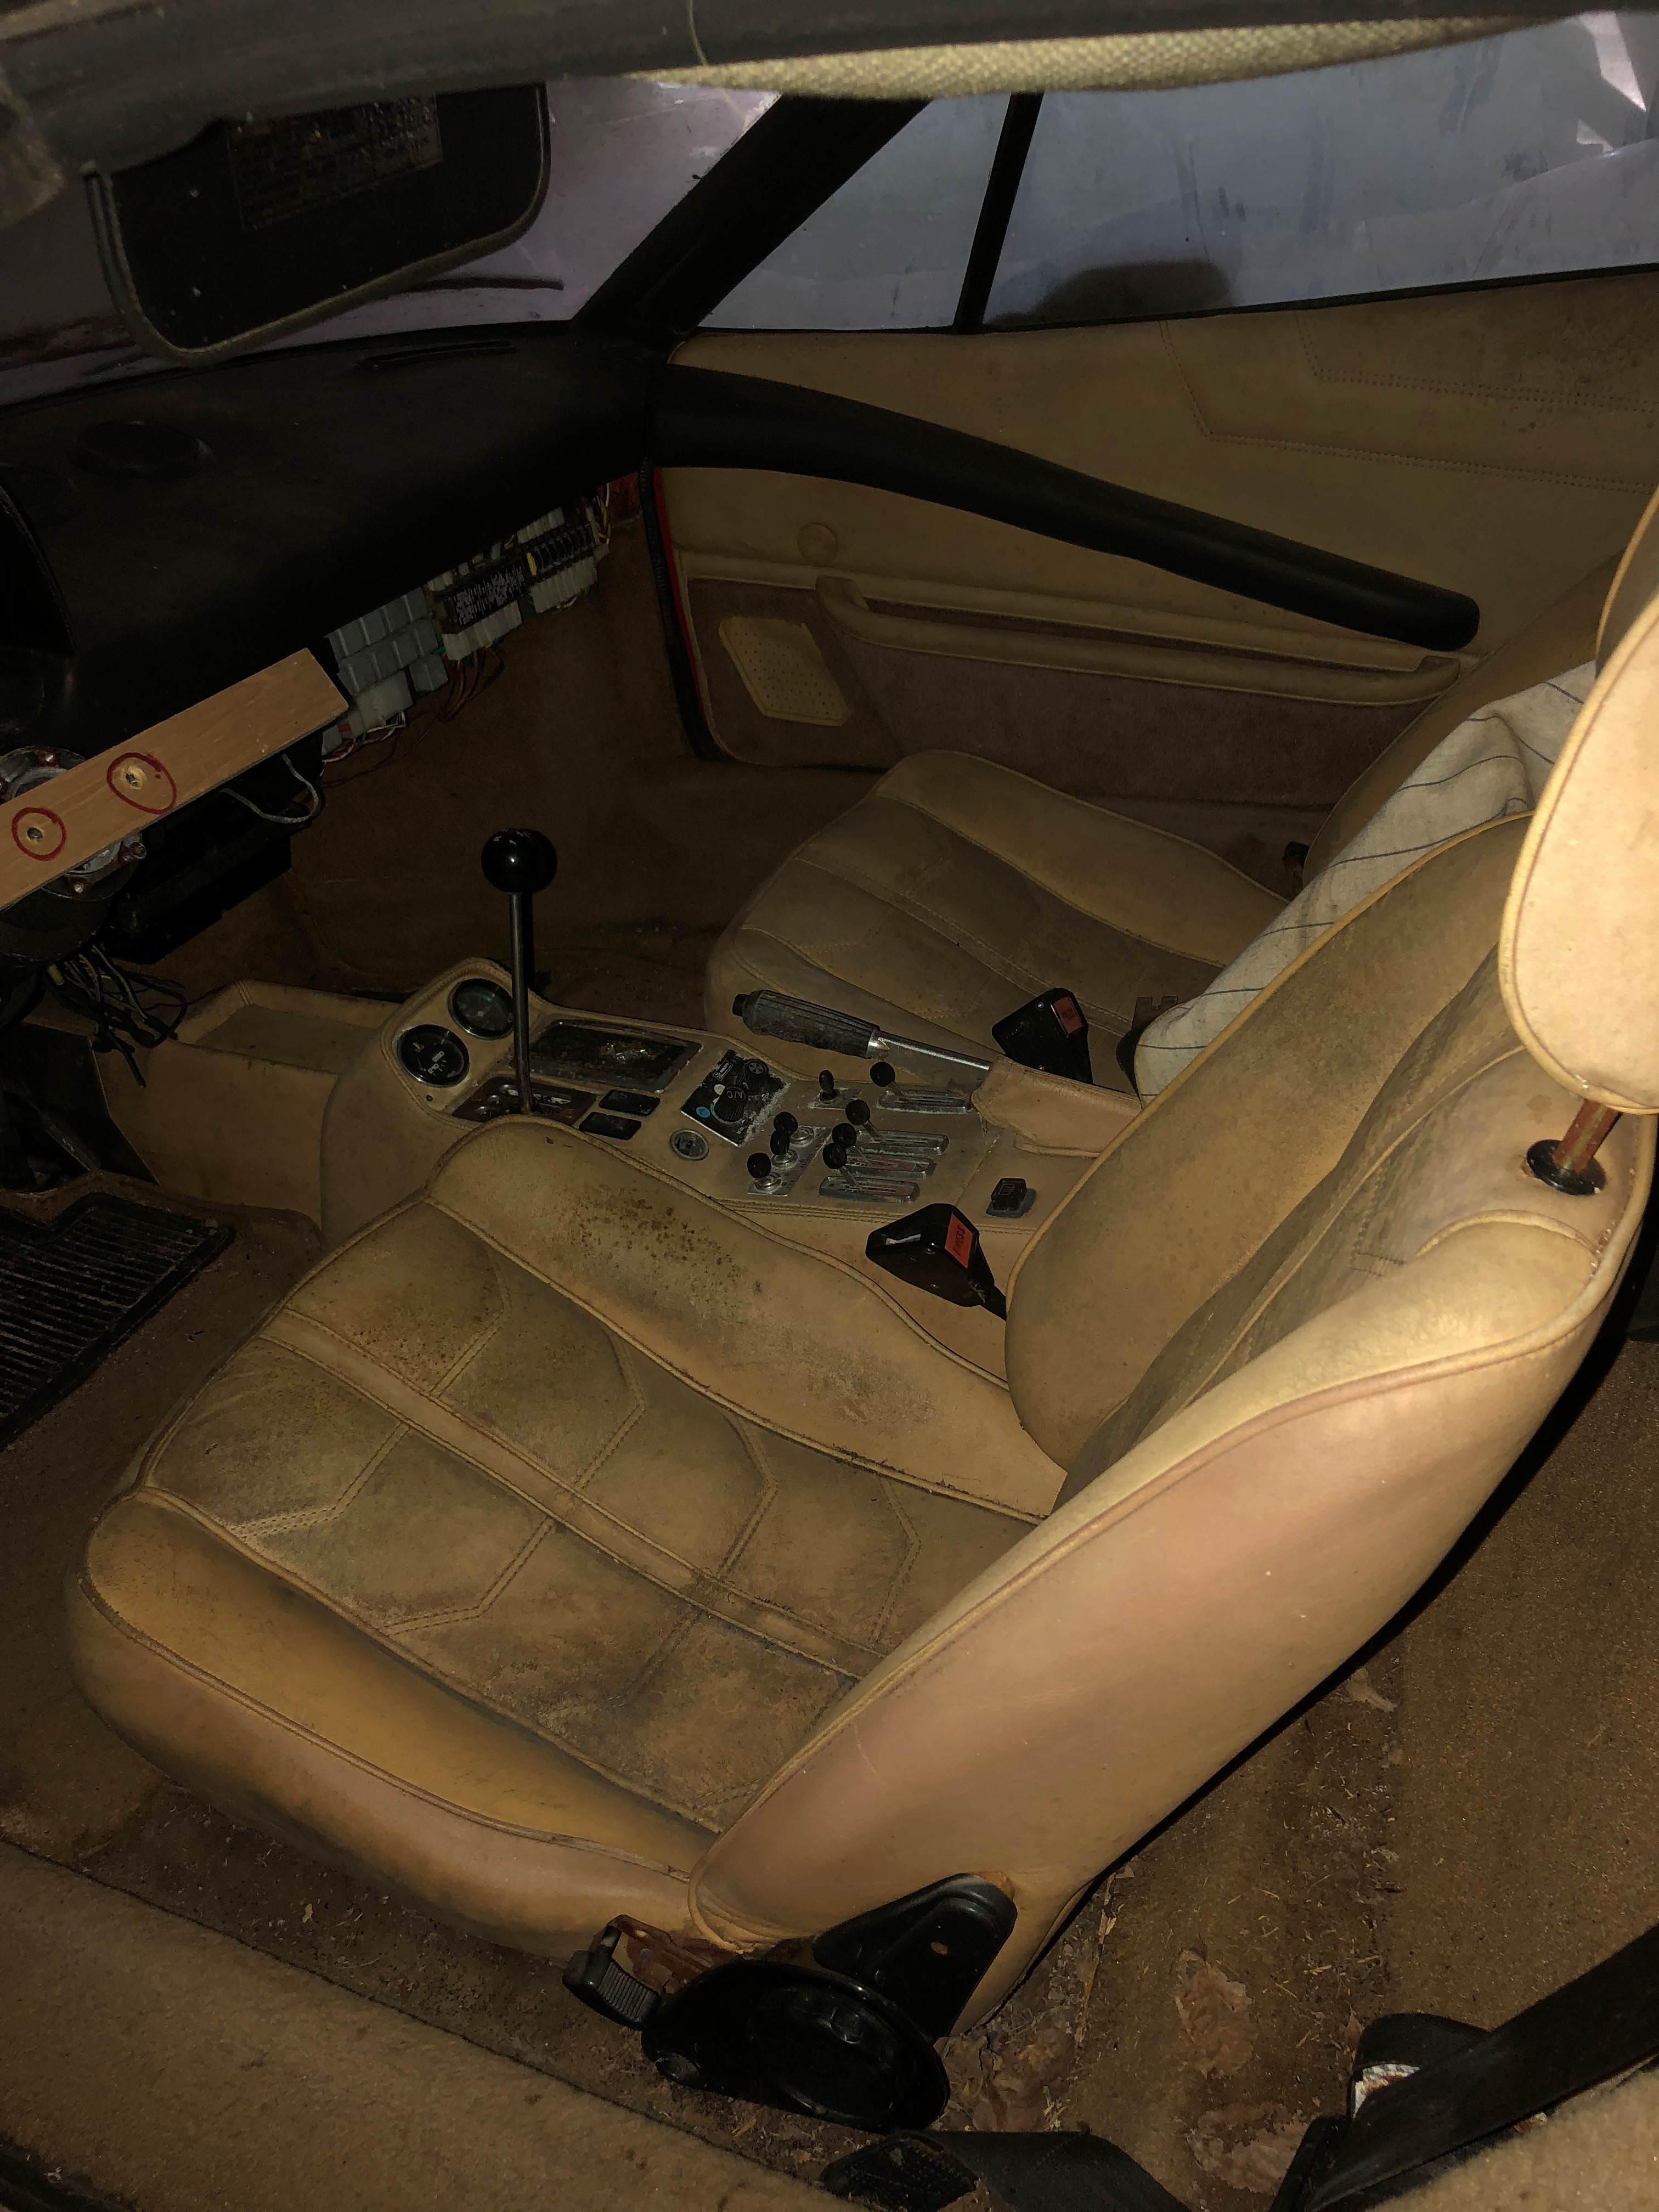 Lamborghini Countach and Ferrari 308 barnfind 6